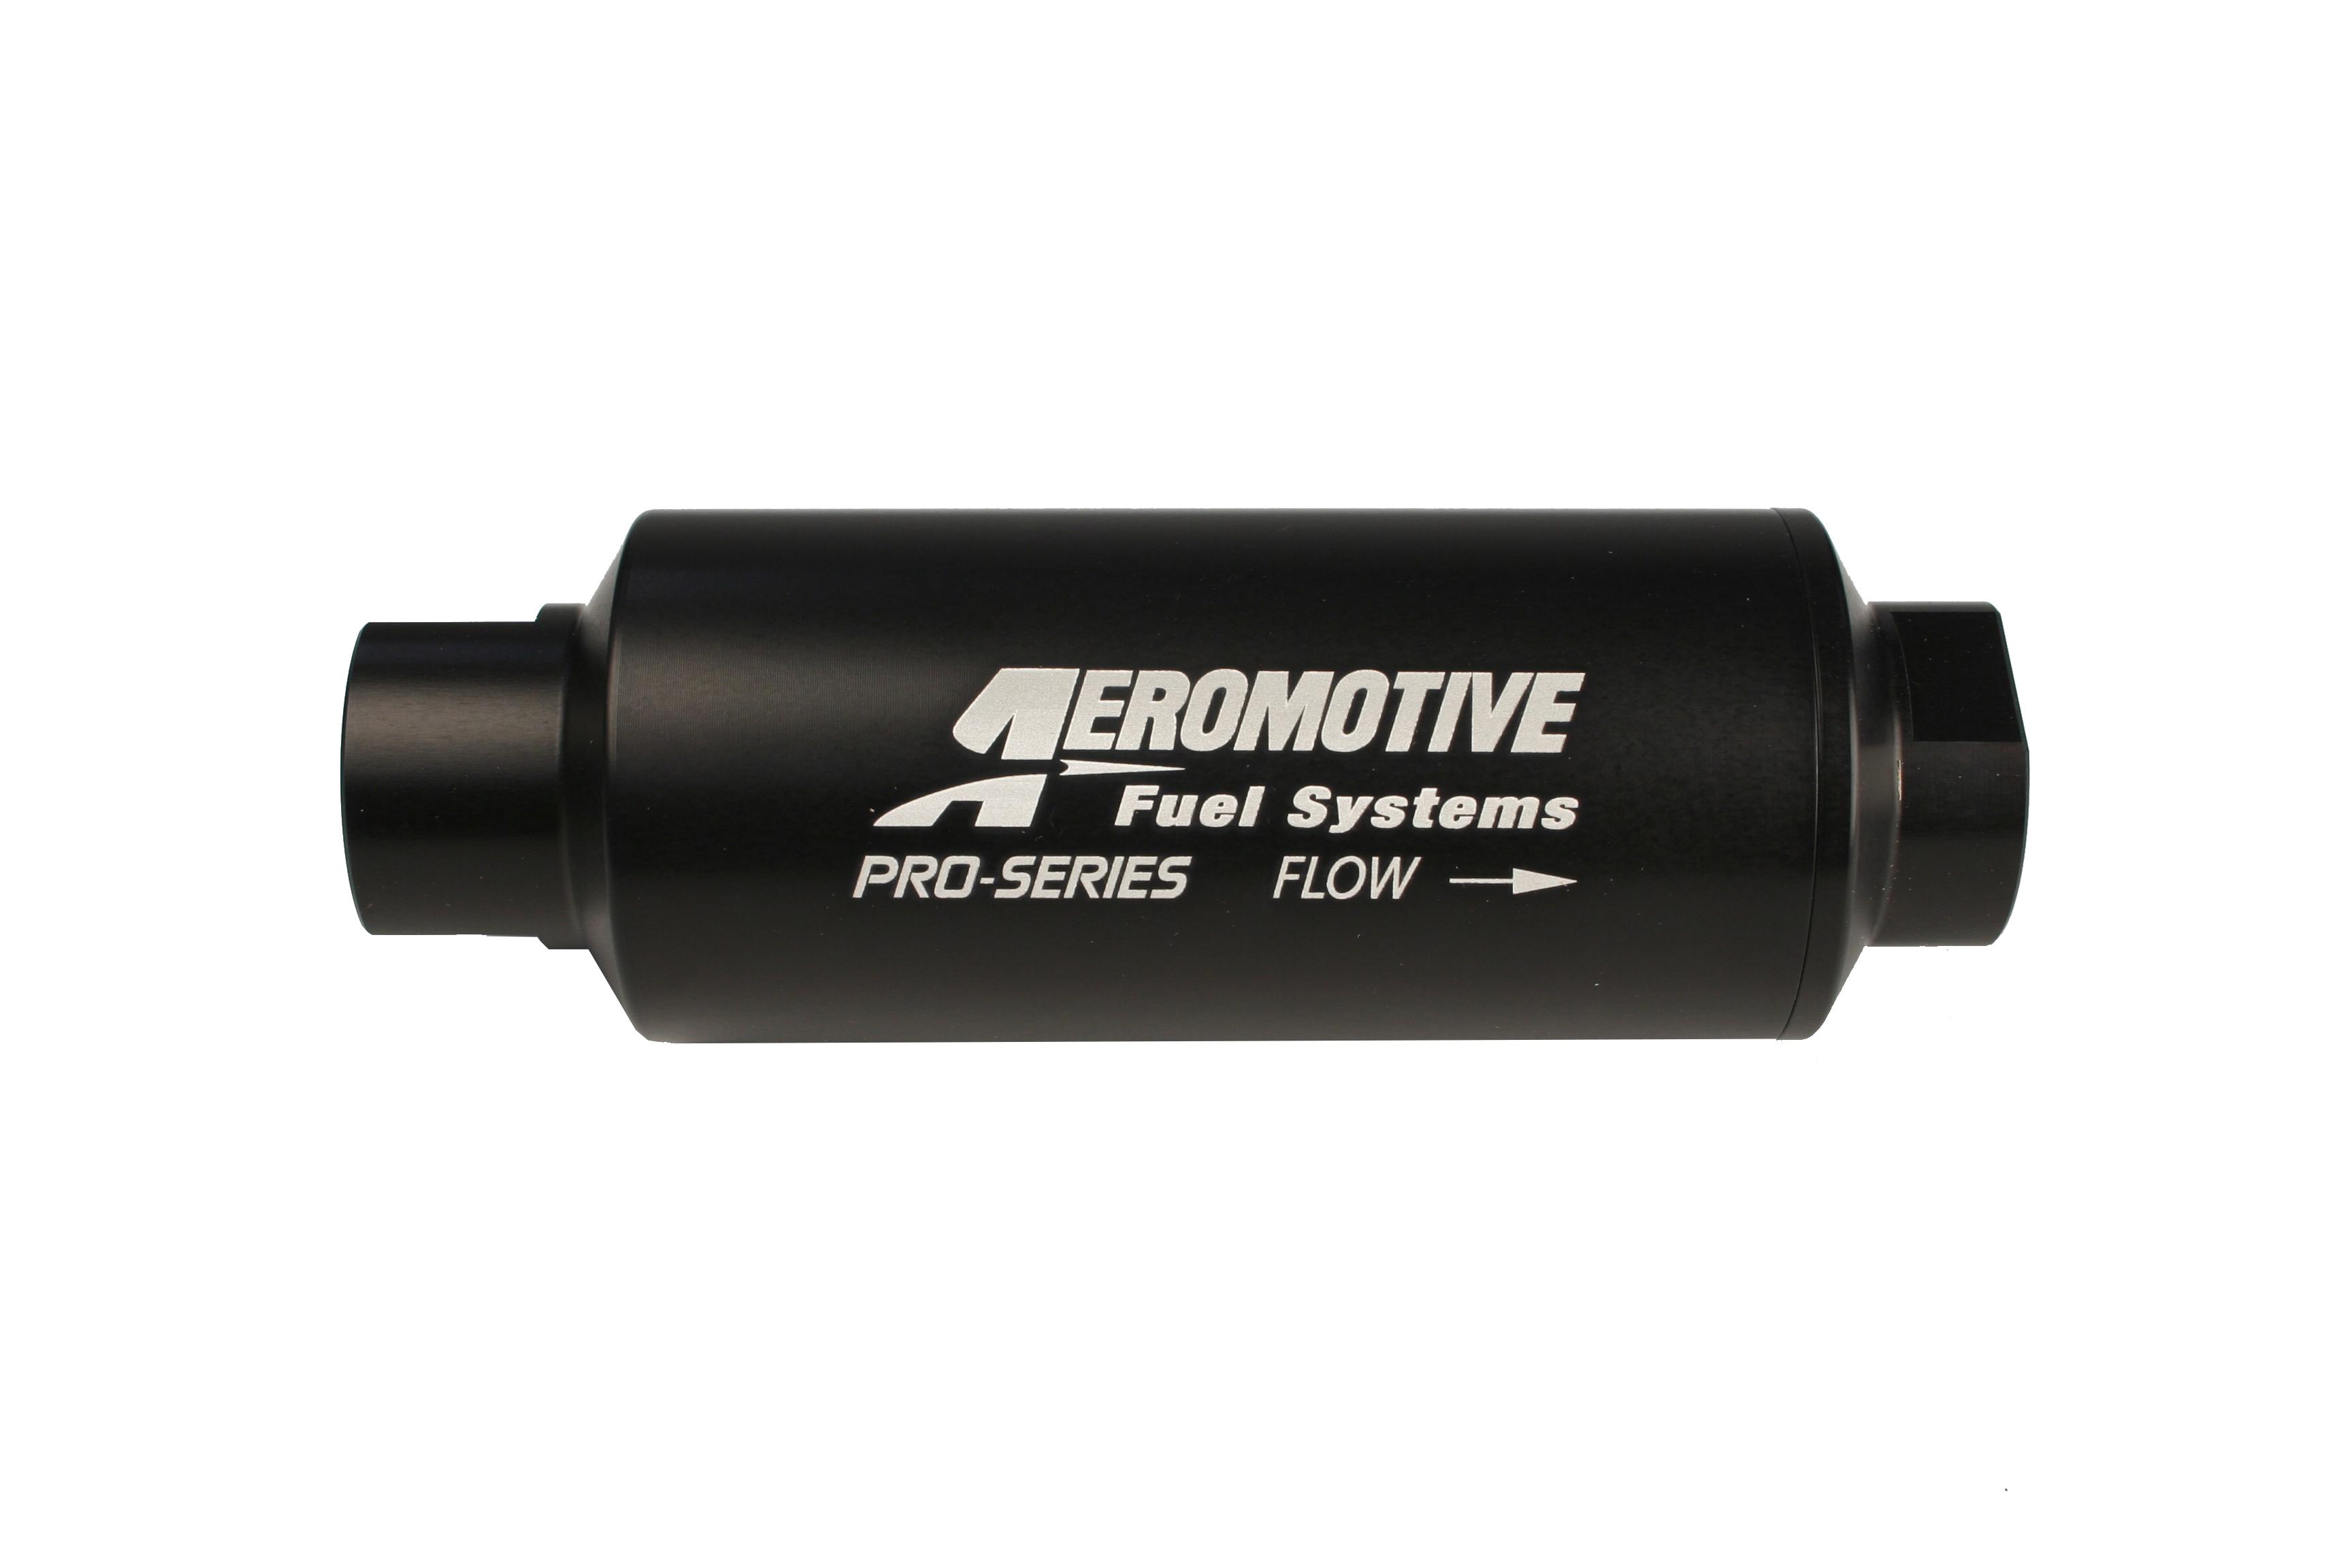 Pro-Series 10 Micron, ORB-12 Fuel Filter – Aeromotive, Inc